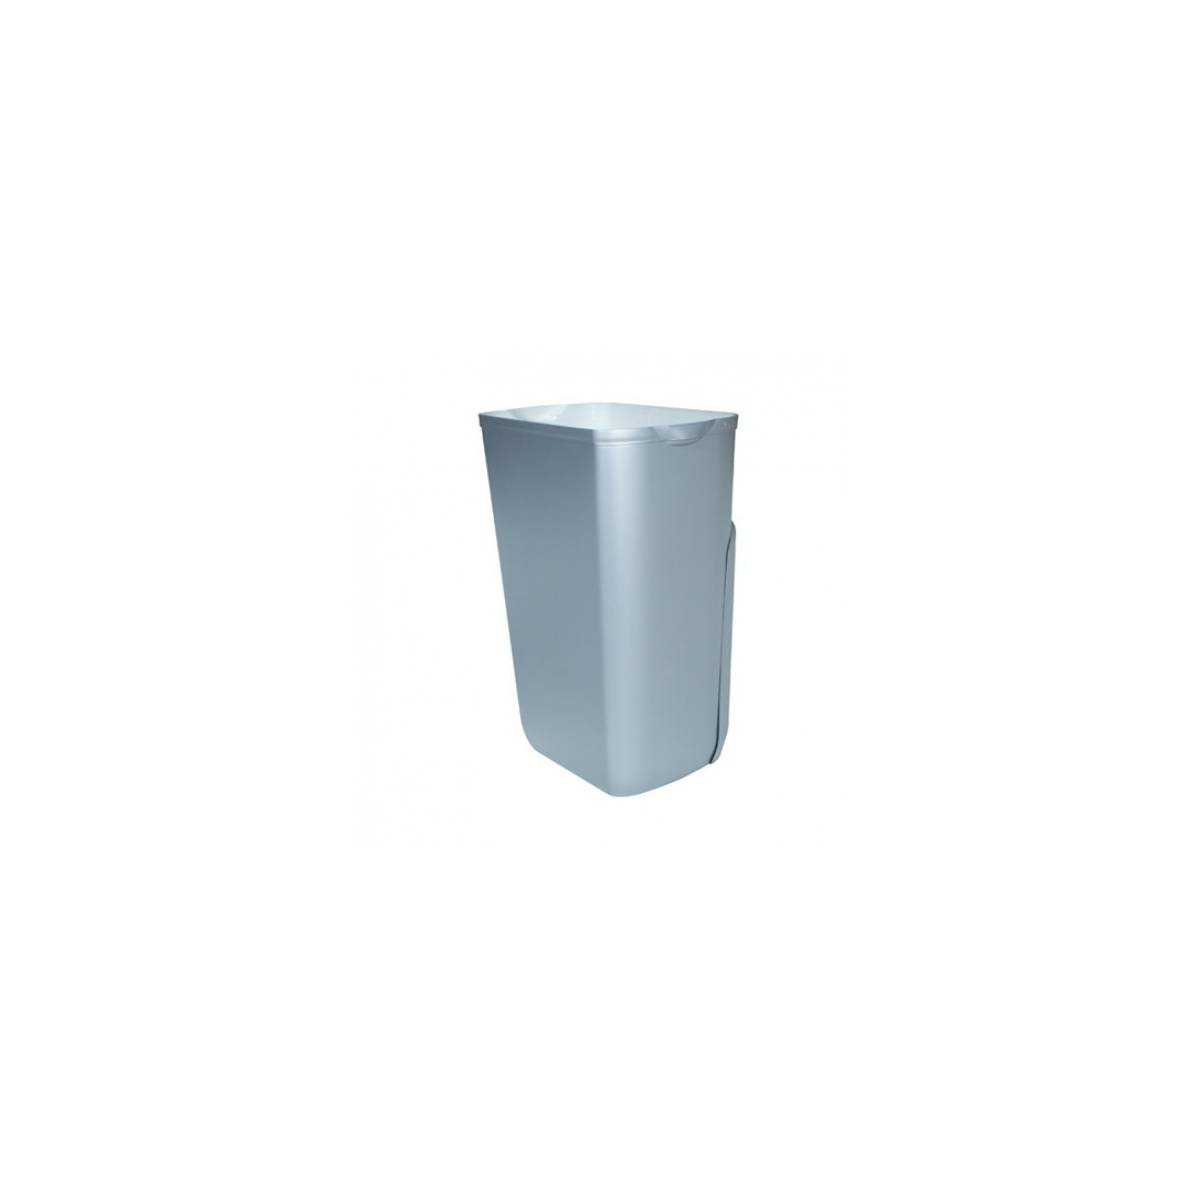 Урна для мусора 23л PRESTIGE (A74201SAT) A74201SAT Mar Plast